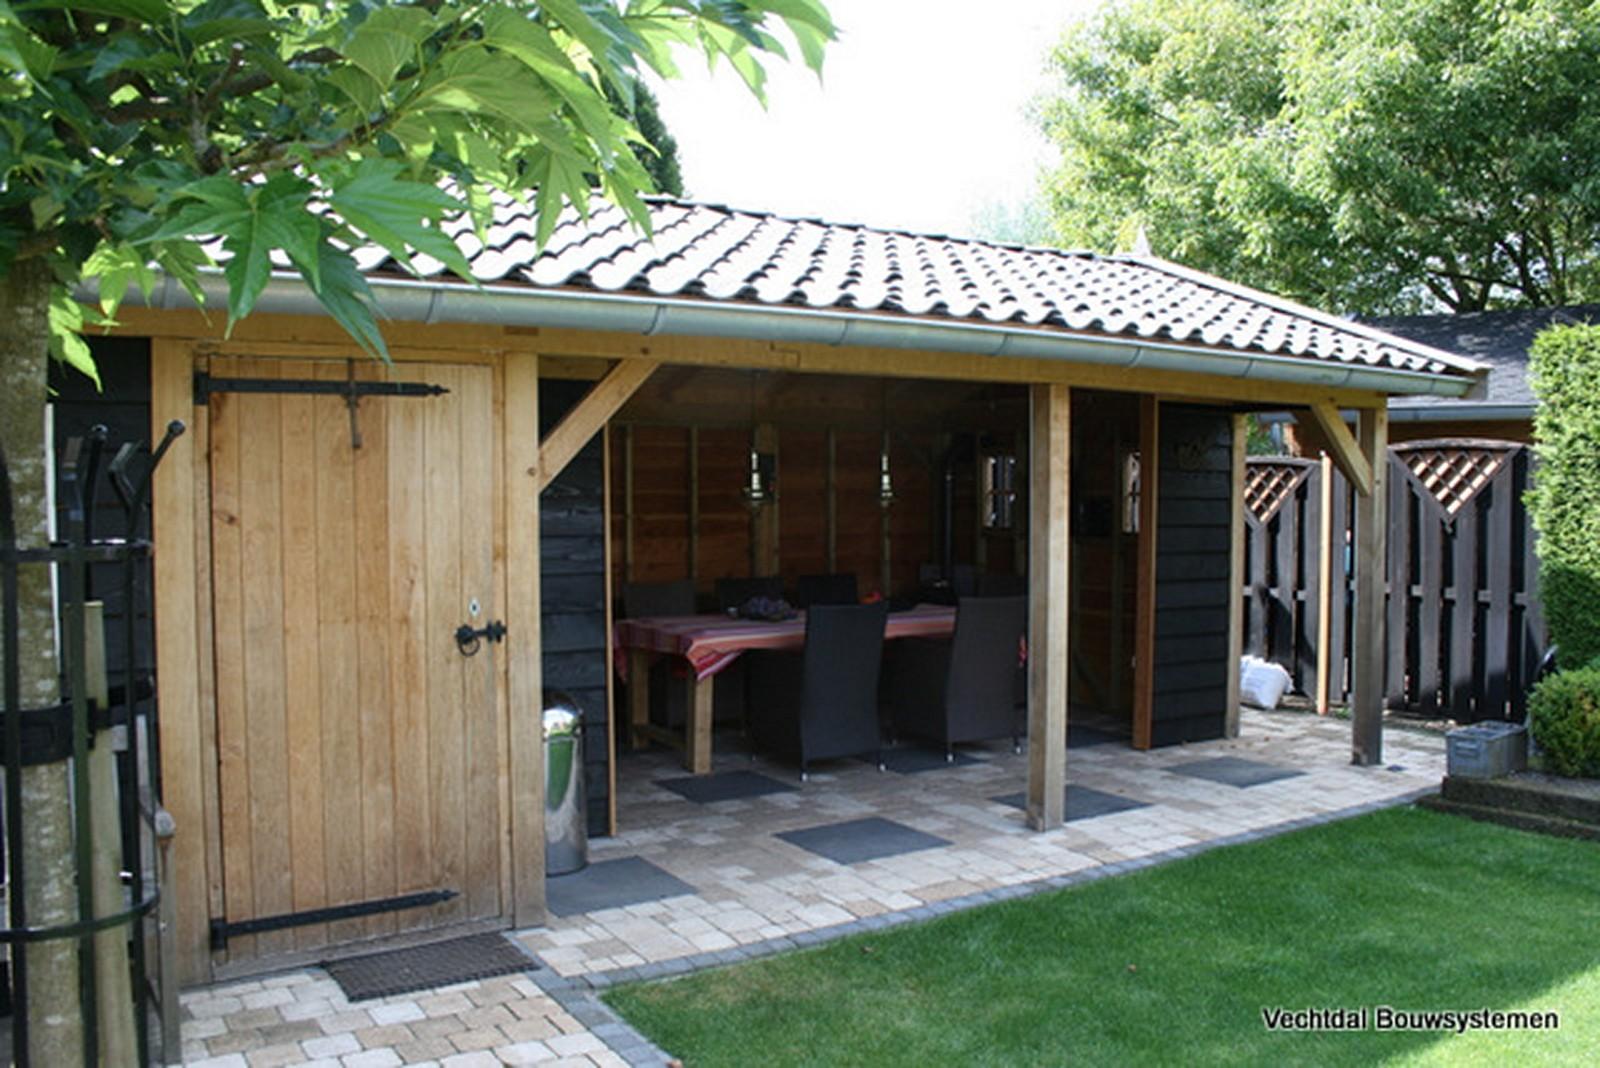 buitenkamer - Authentiek eikenhouten tuinhuis met tuinkamer.